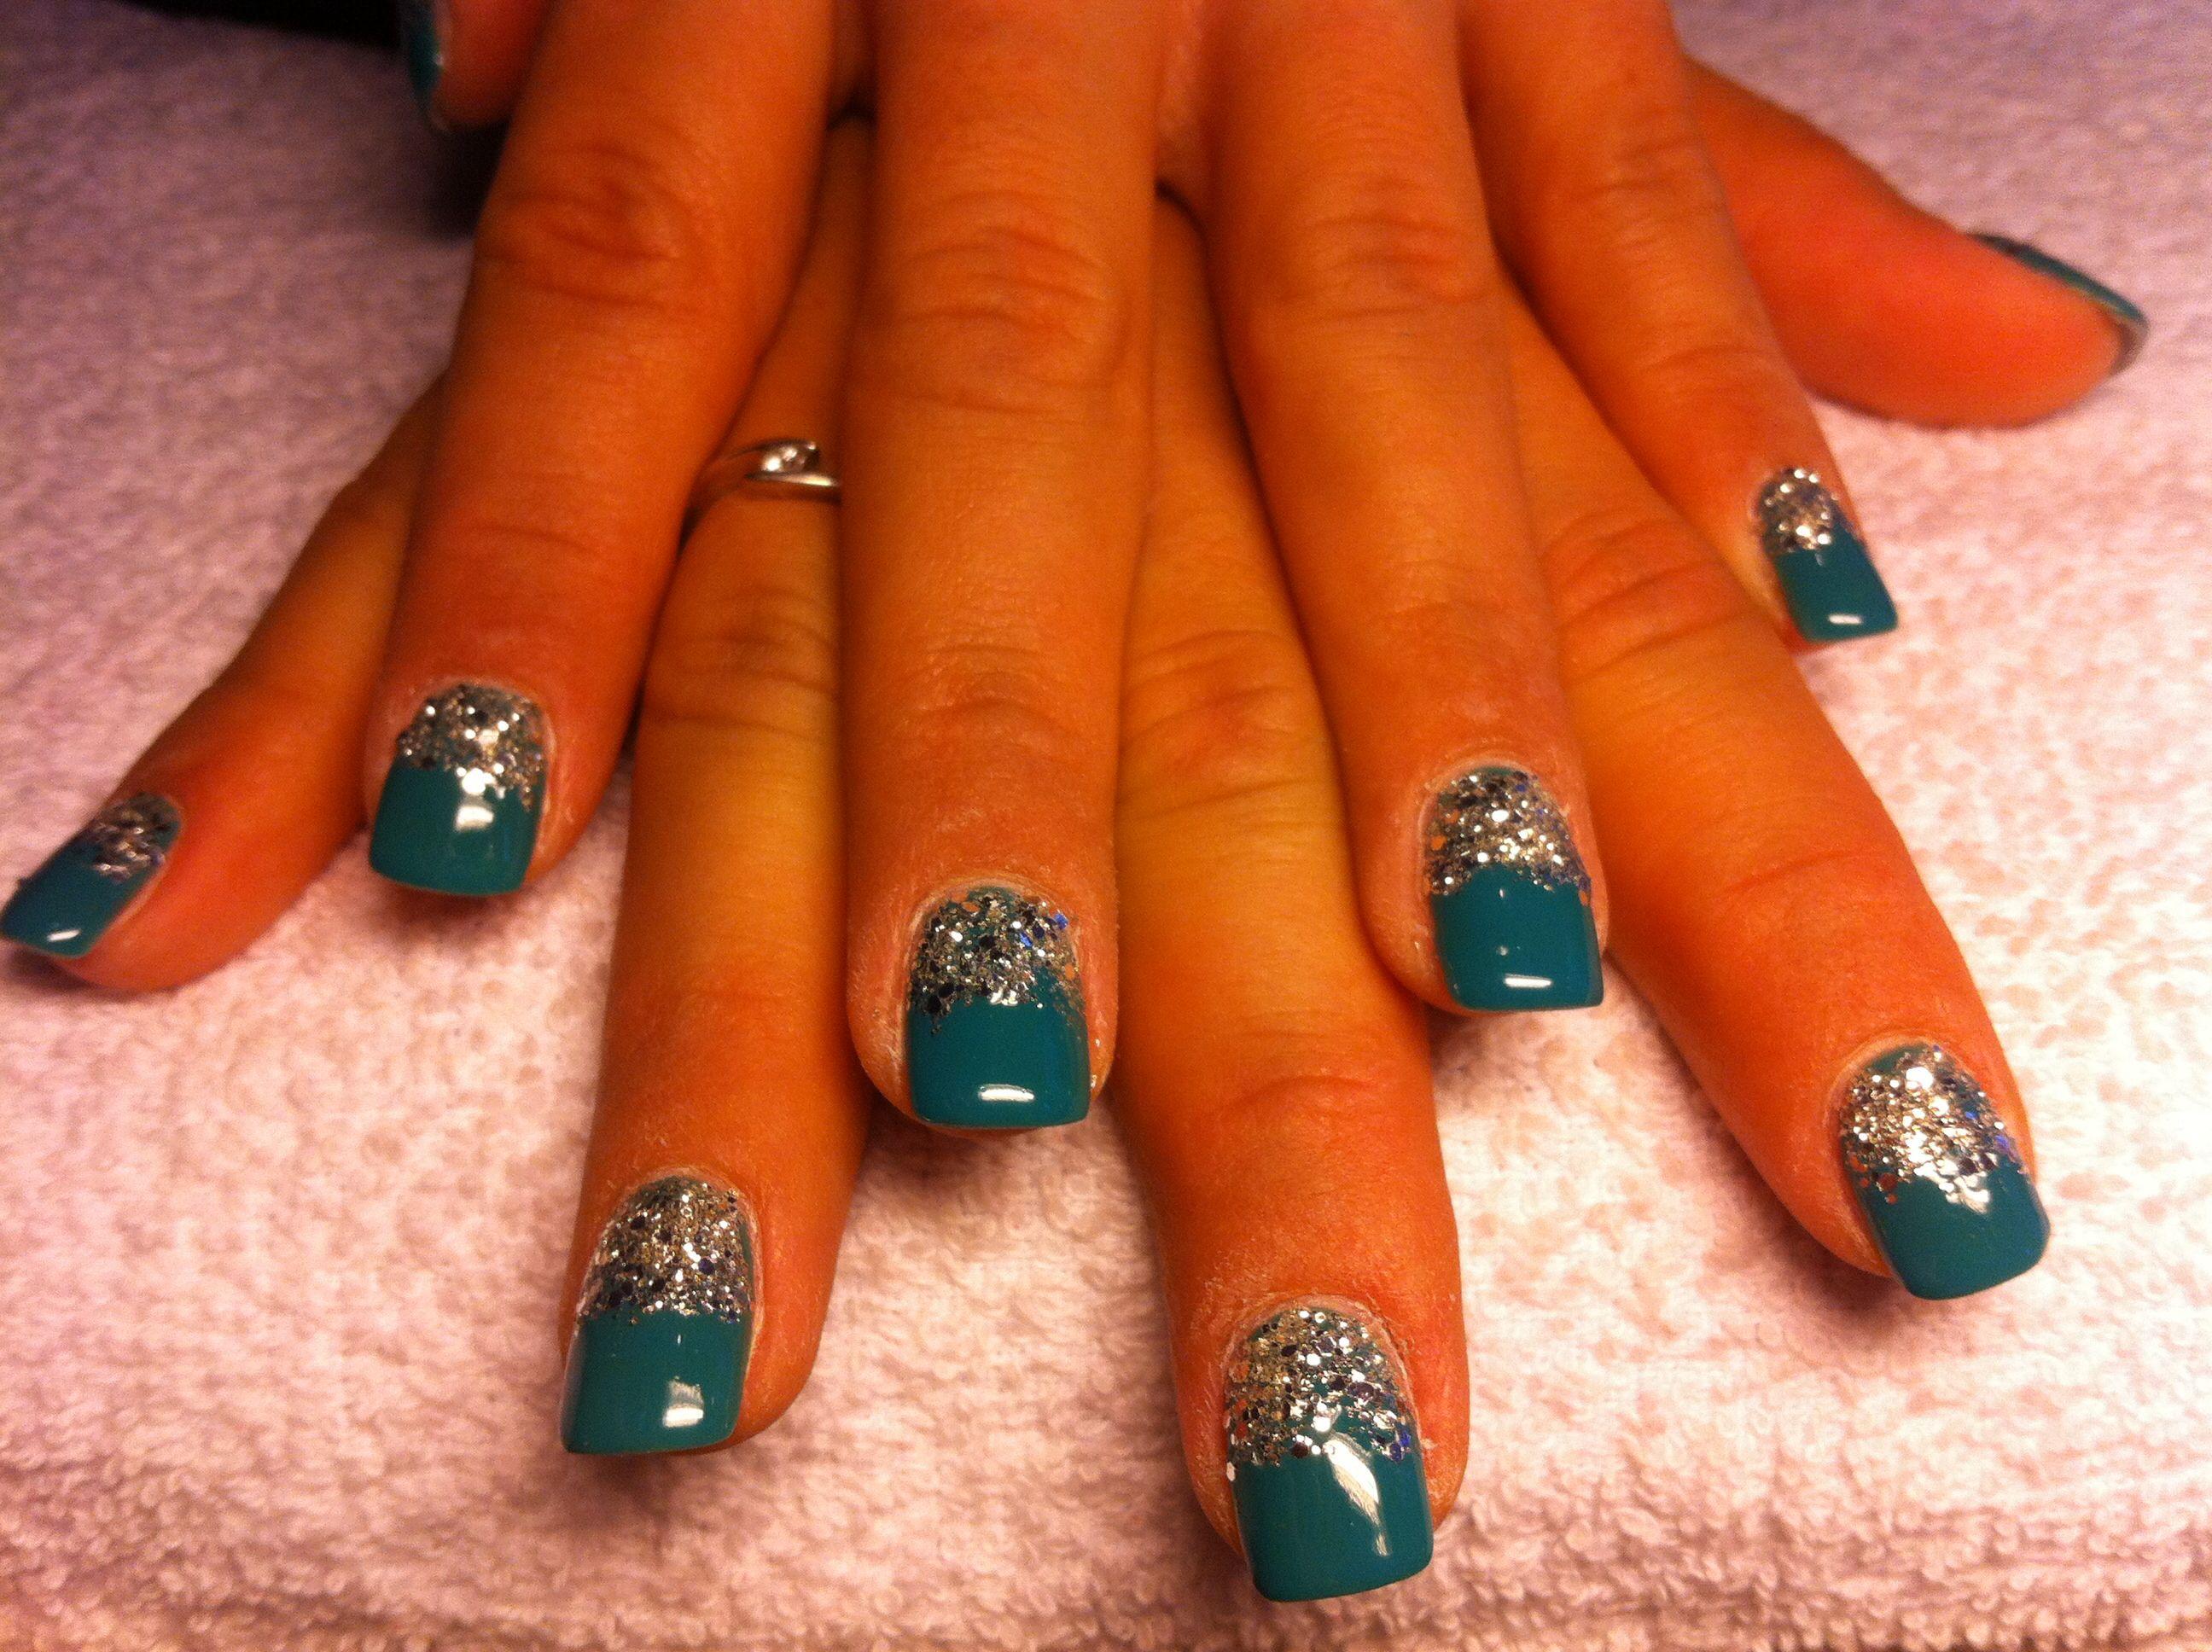 Gellak groen jade met silver glitter